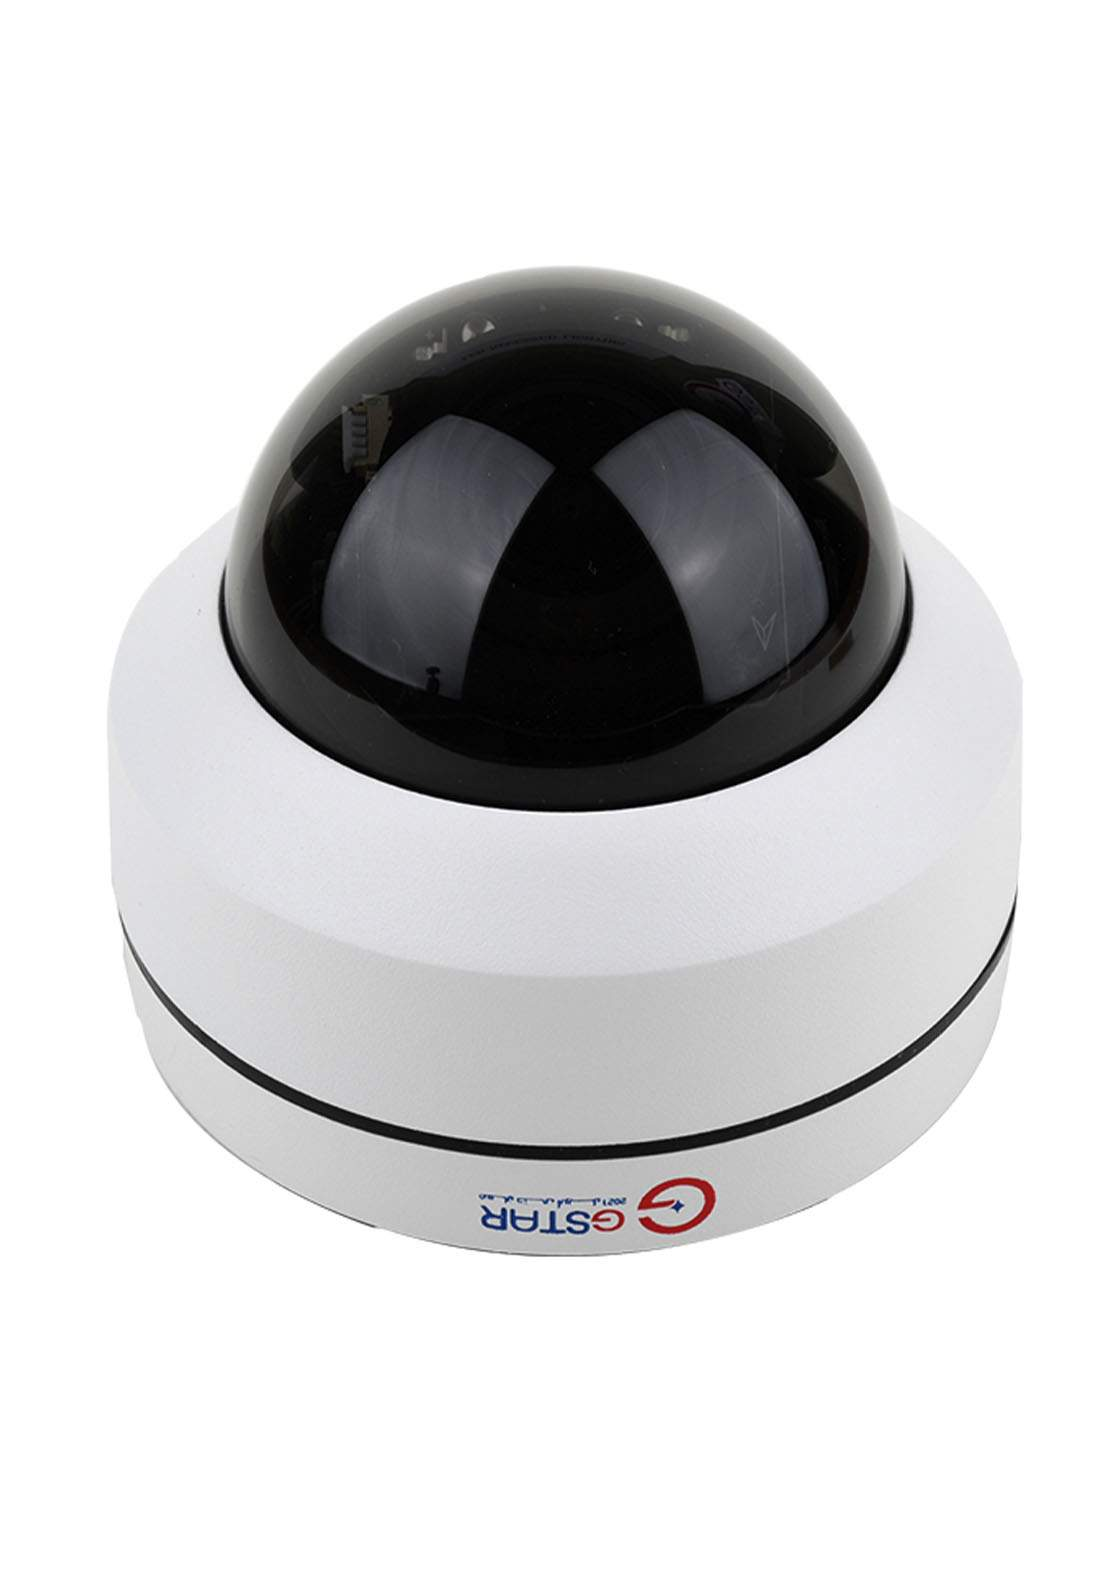 Gstar Analog High Definition Camera AHD 2MP 4-in-1 - White كاميرا مراقبة